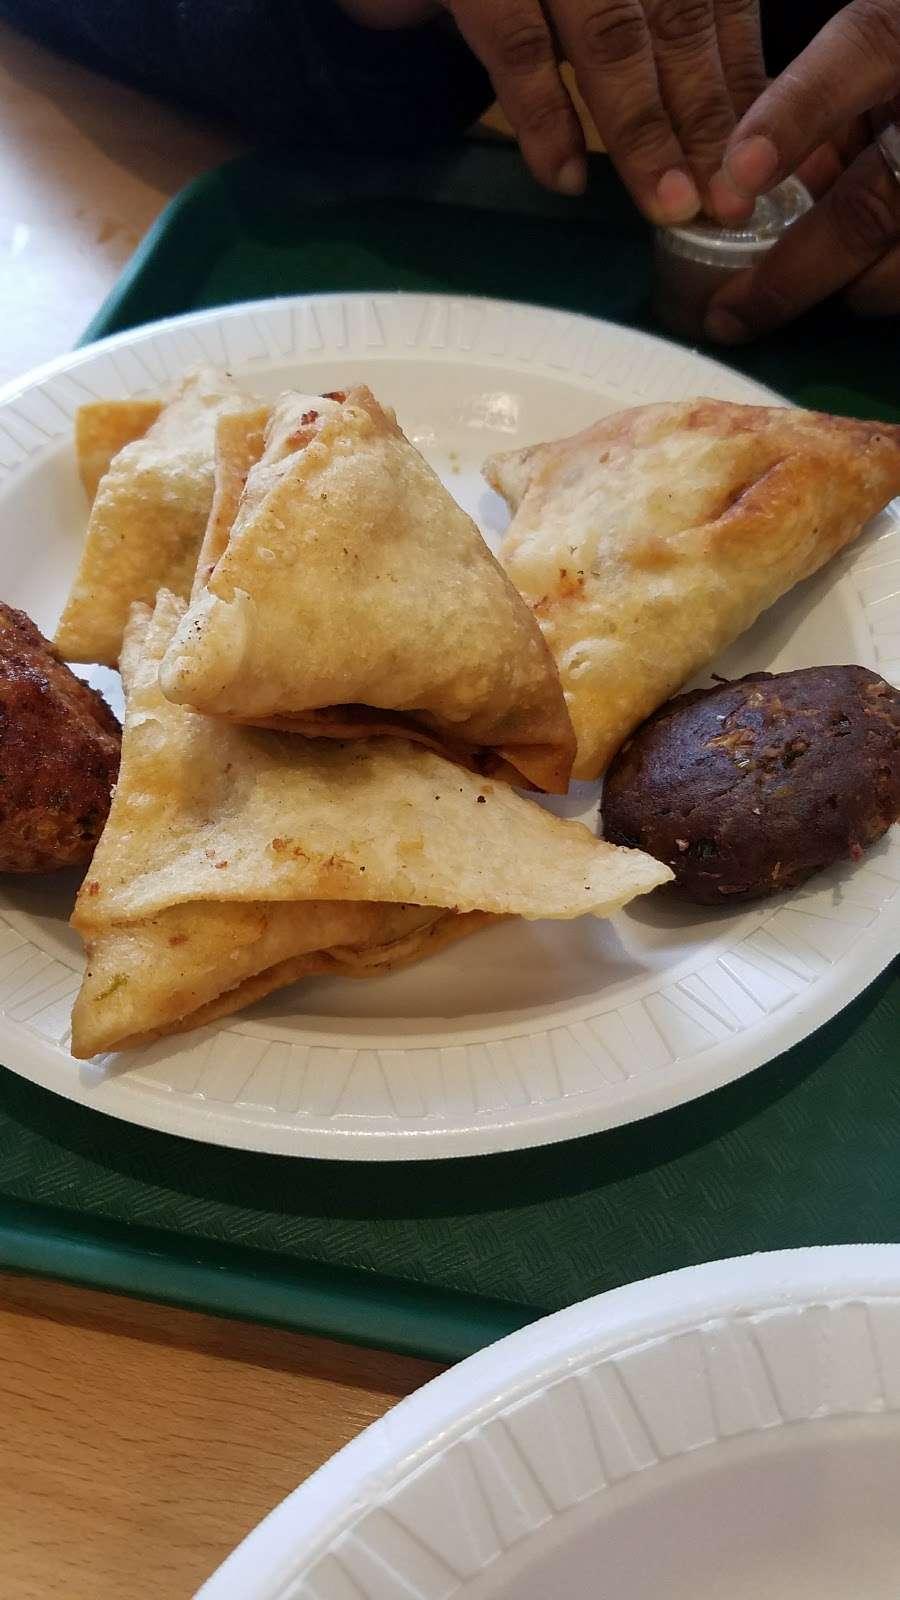 Aladdin Sweets - restaurant  | Photo 7 of 10 | Address: 29-06 36th Ave, Astoria, NY 11106, USA | Phone: (718) 784-2554